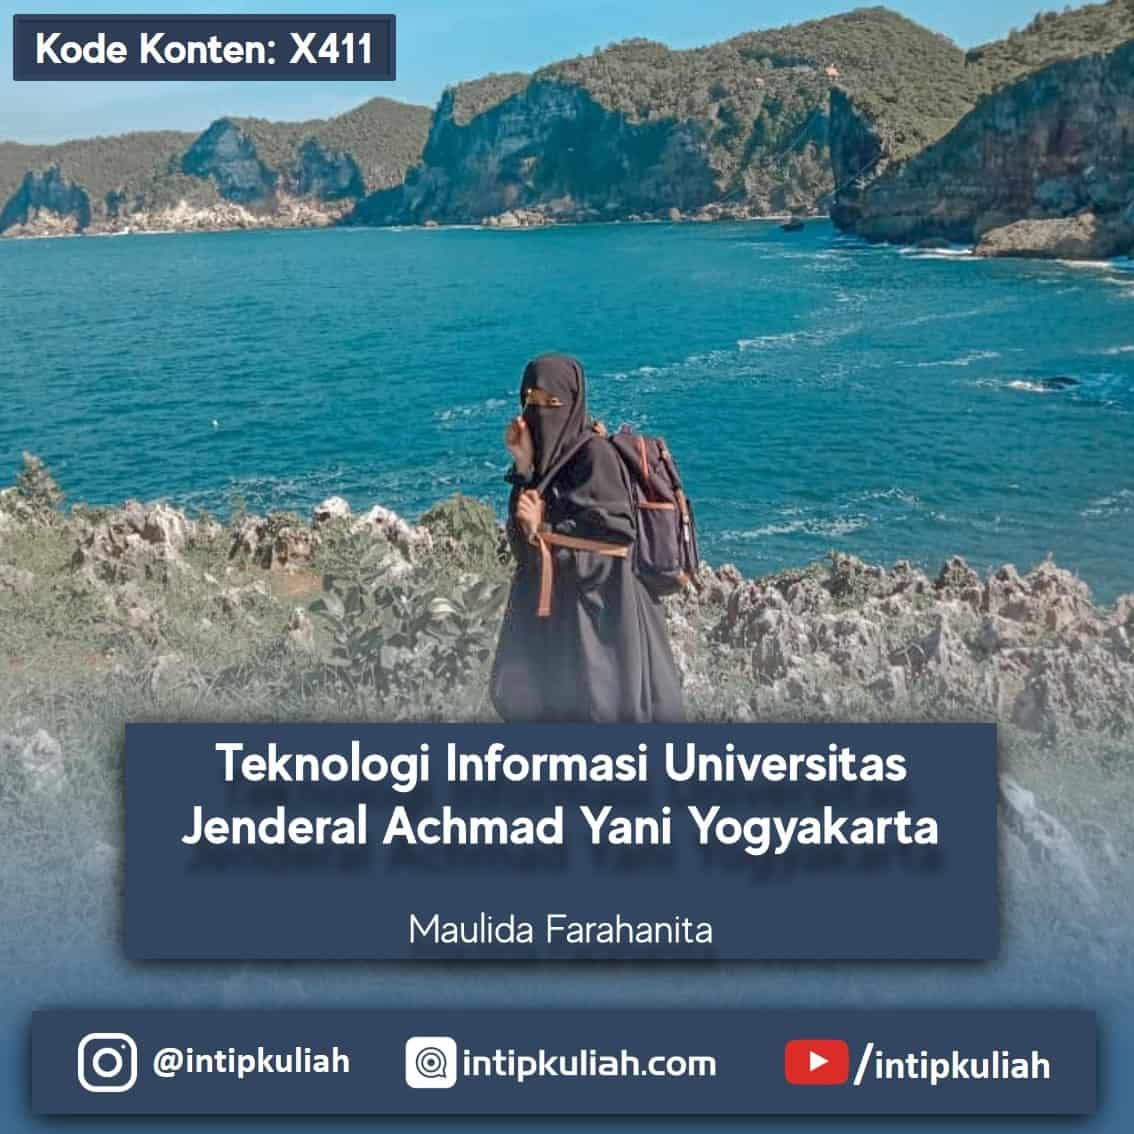 Teknologi Informasi Unjani (Maulida)